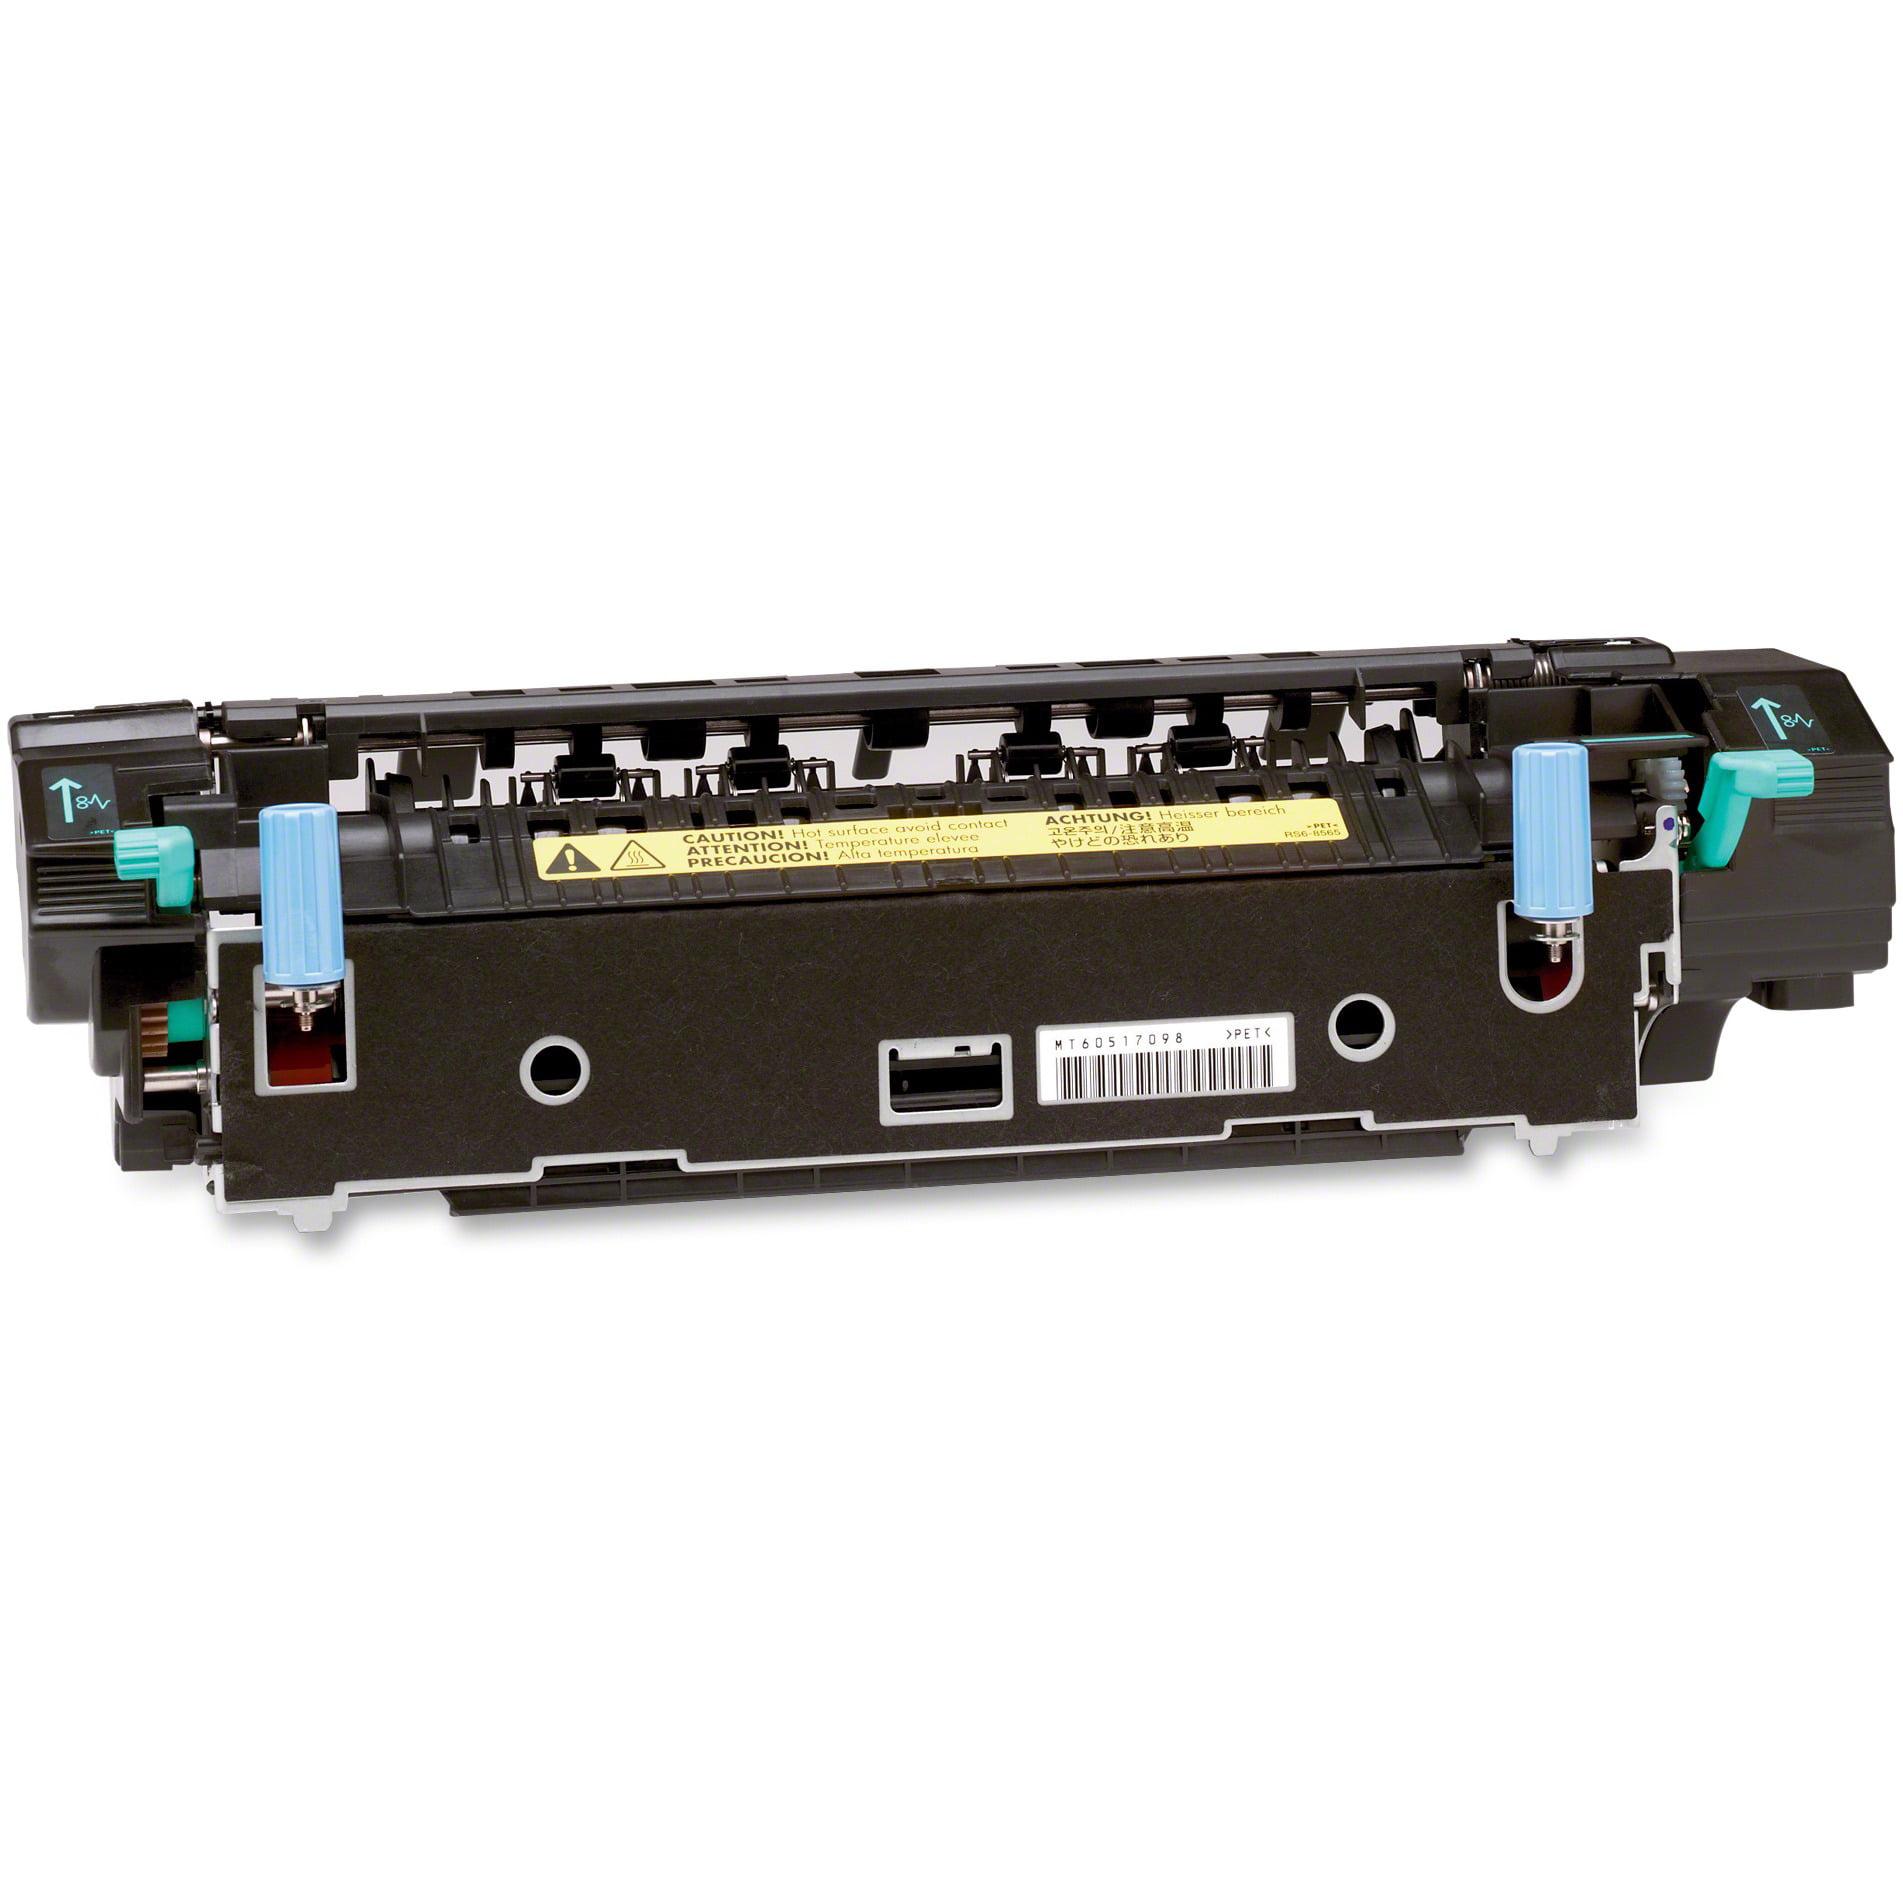 HP, HEWQ3676A, Q3676A Laser Fuser Kit, 1